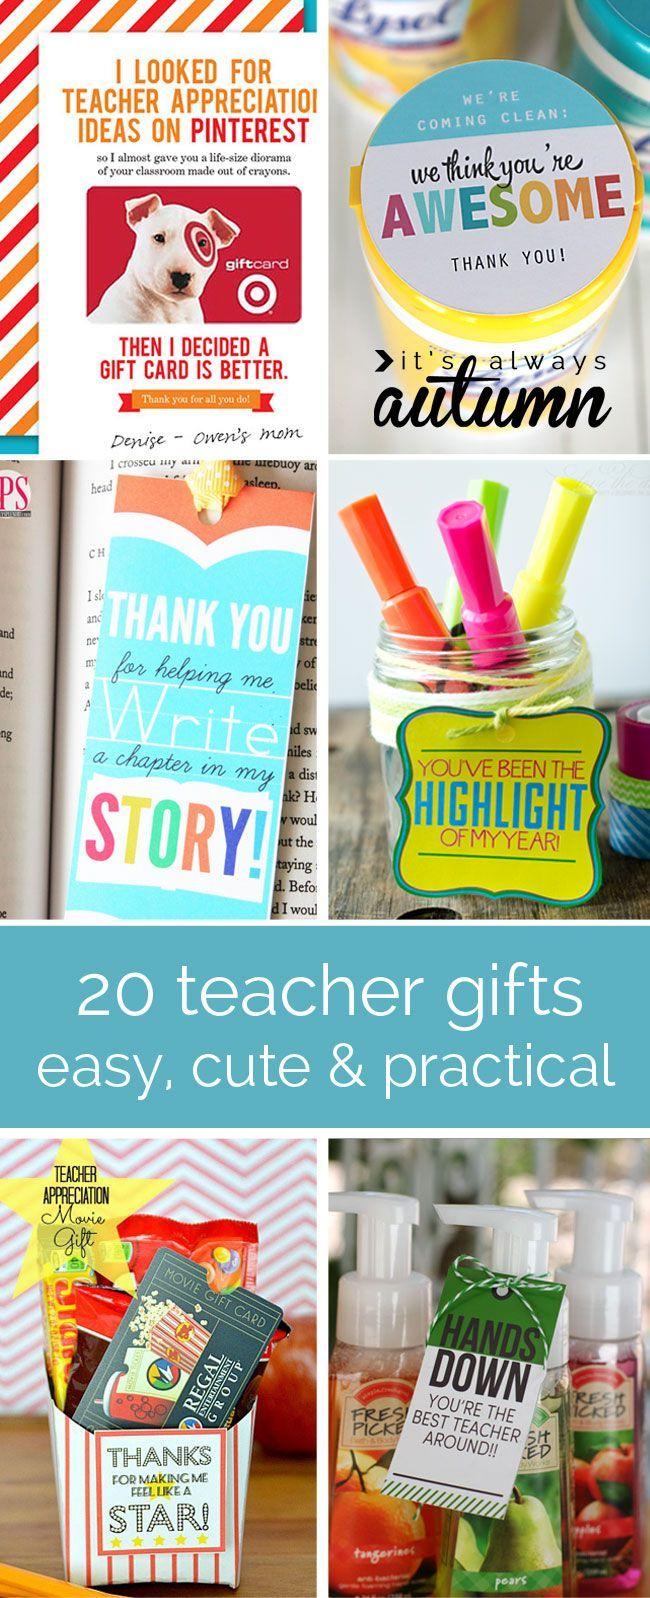 Teacher-Gifts-Ideas-20-cute-easy-cheap-practical-teacher ...